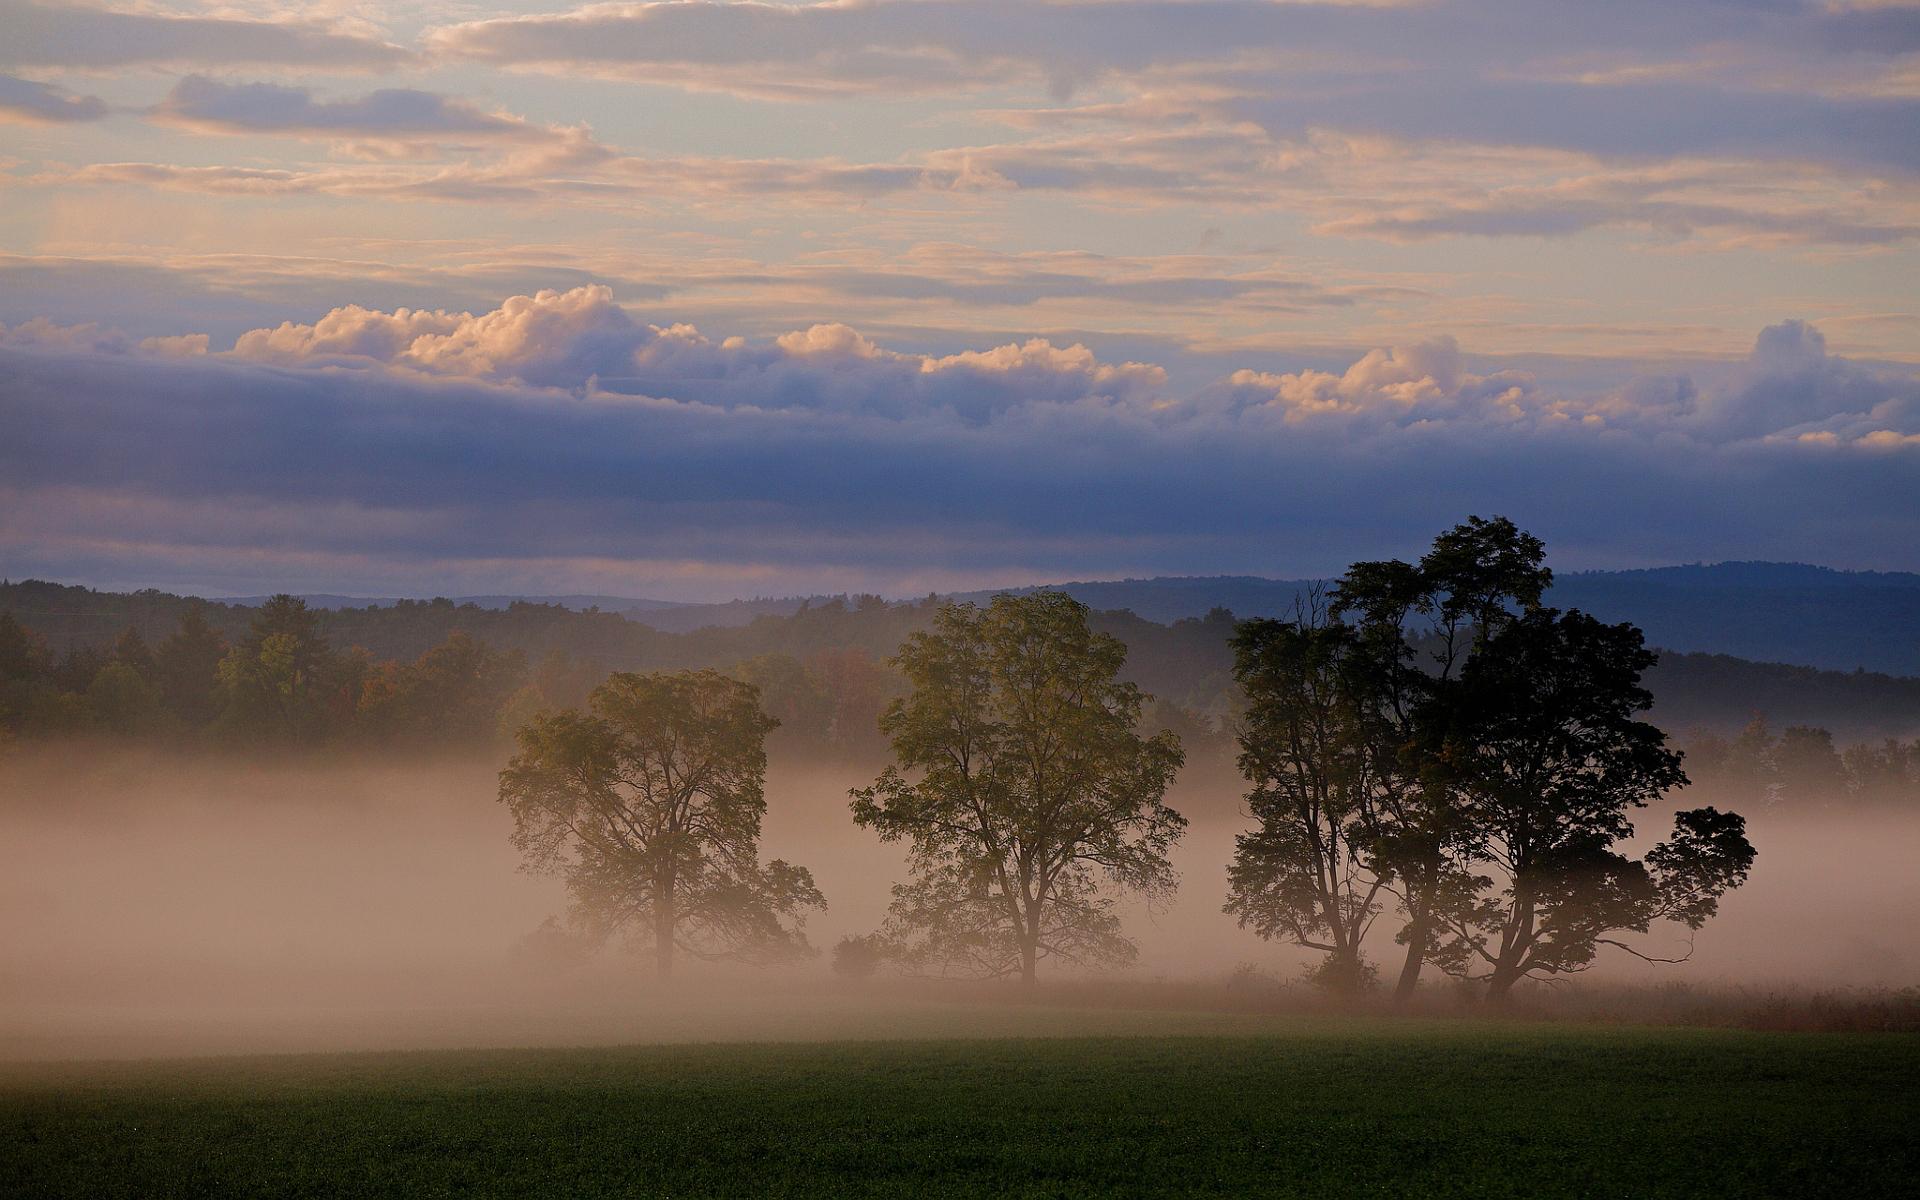 foggy lanscape scenery